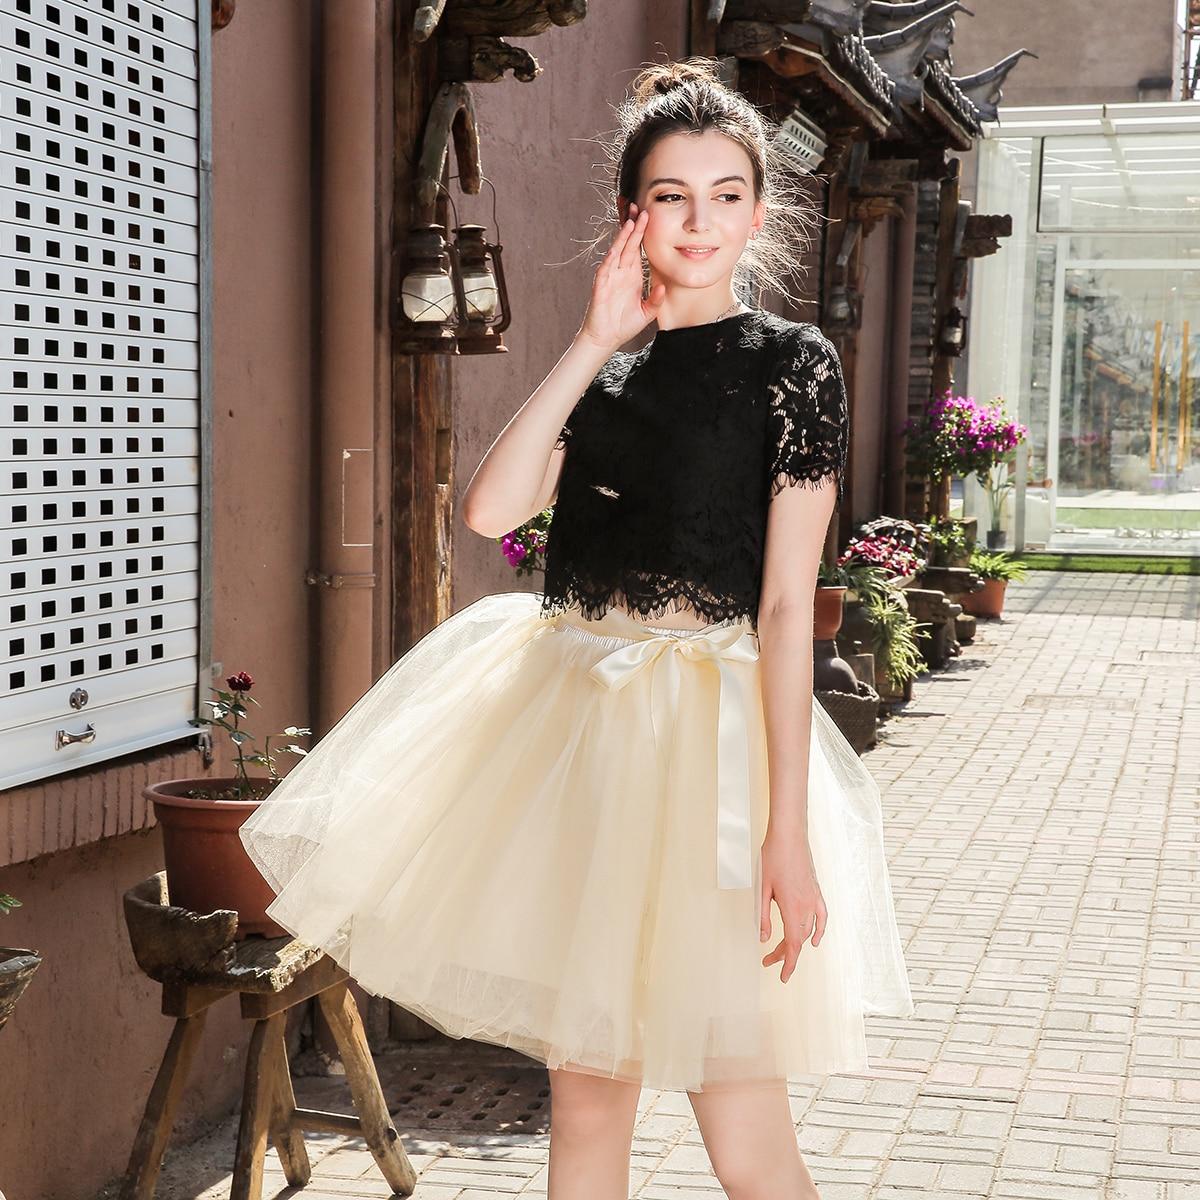 Skirts Womens 7 Layers Midi Tulle Skirt Fashion Tutu Skirts Women Ball Gown Party Petticoat 19 Lolita Faldas Saia